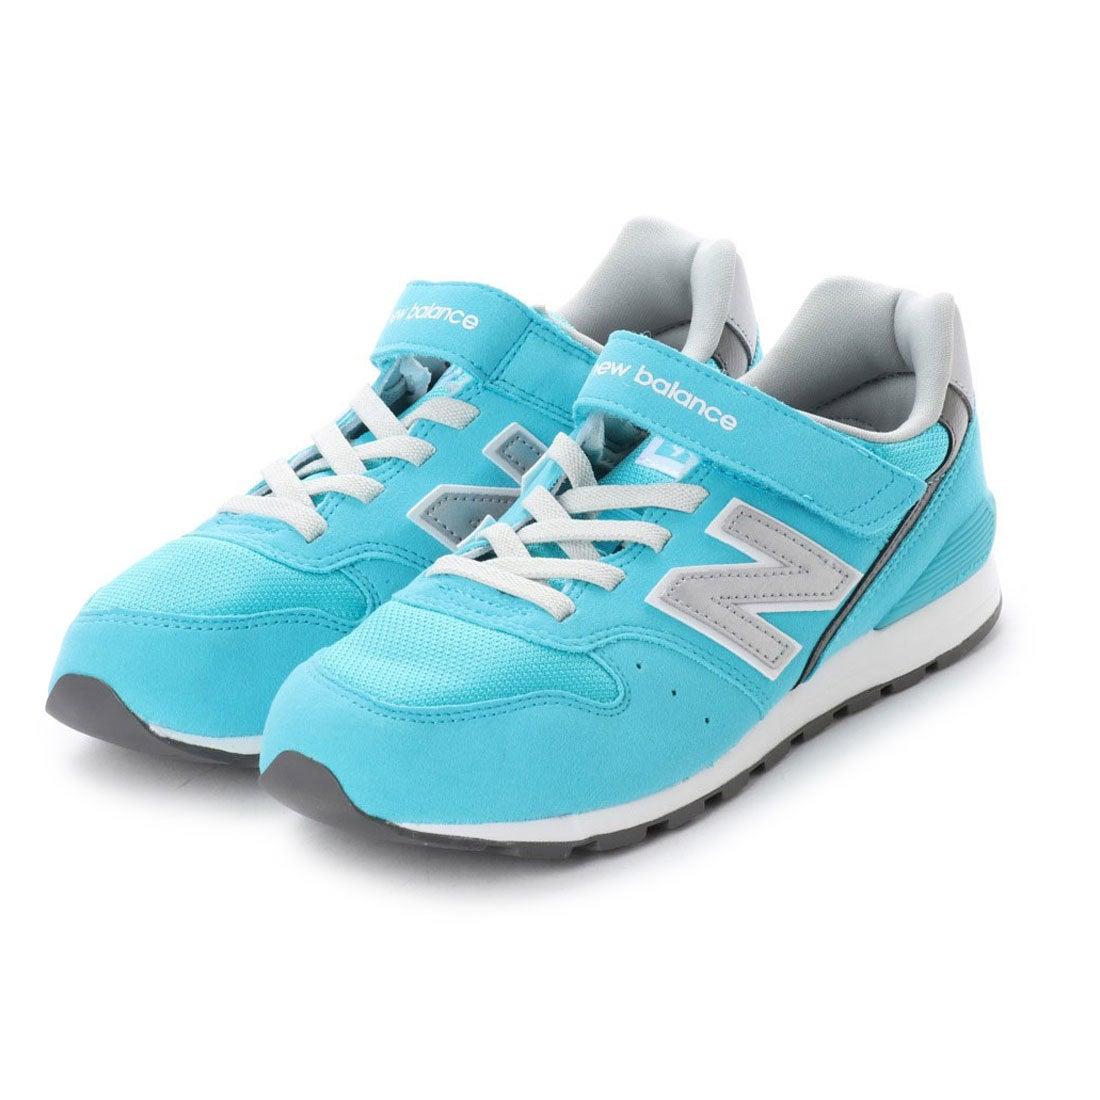 01982286cb871 ニューバランス new balance NB KV996 TBY (TBY(ターコイズブルー)) -靴&ファッション通販  ロコンド〜自宅で試着、気軽に返品